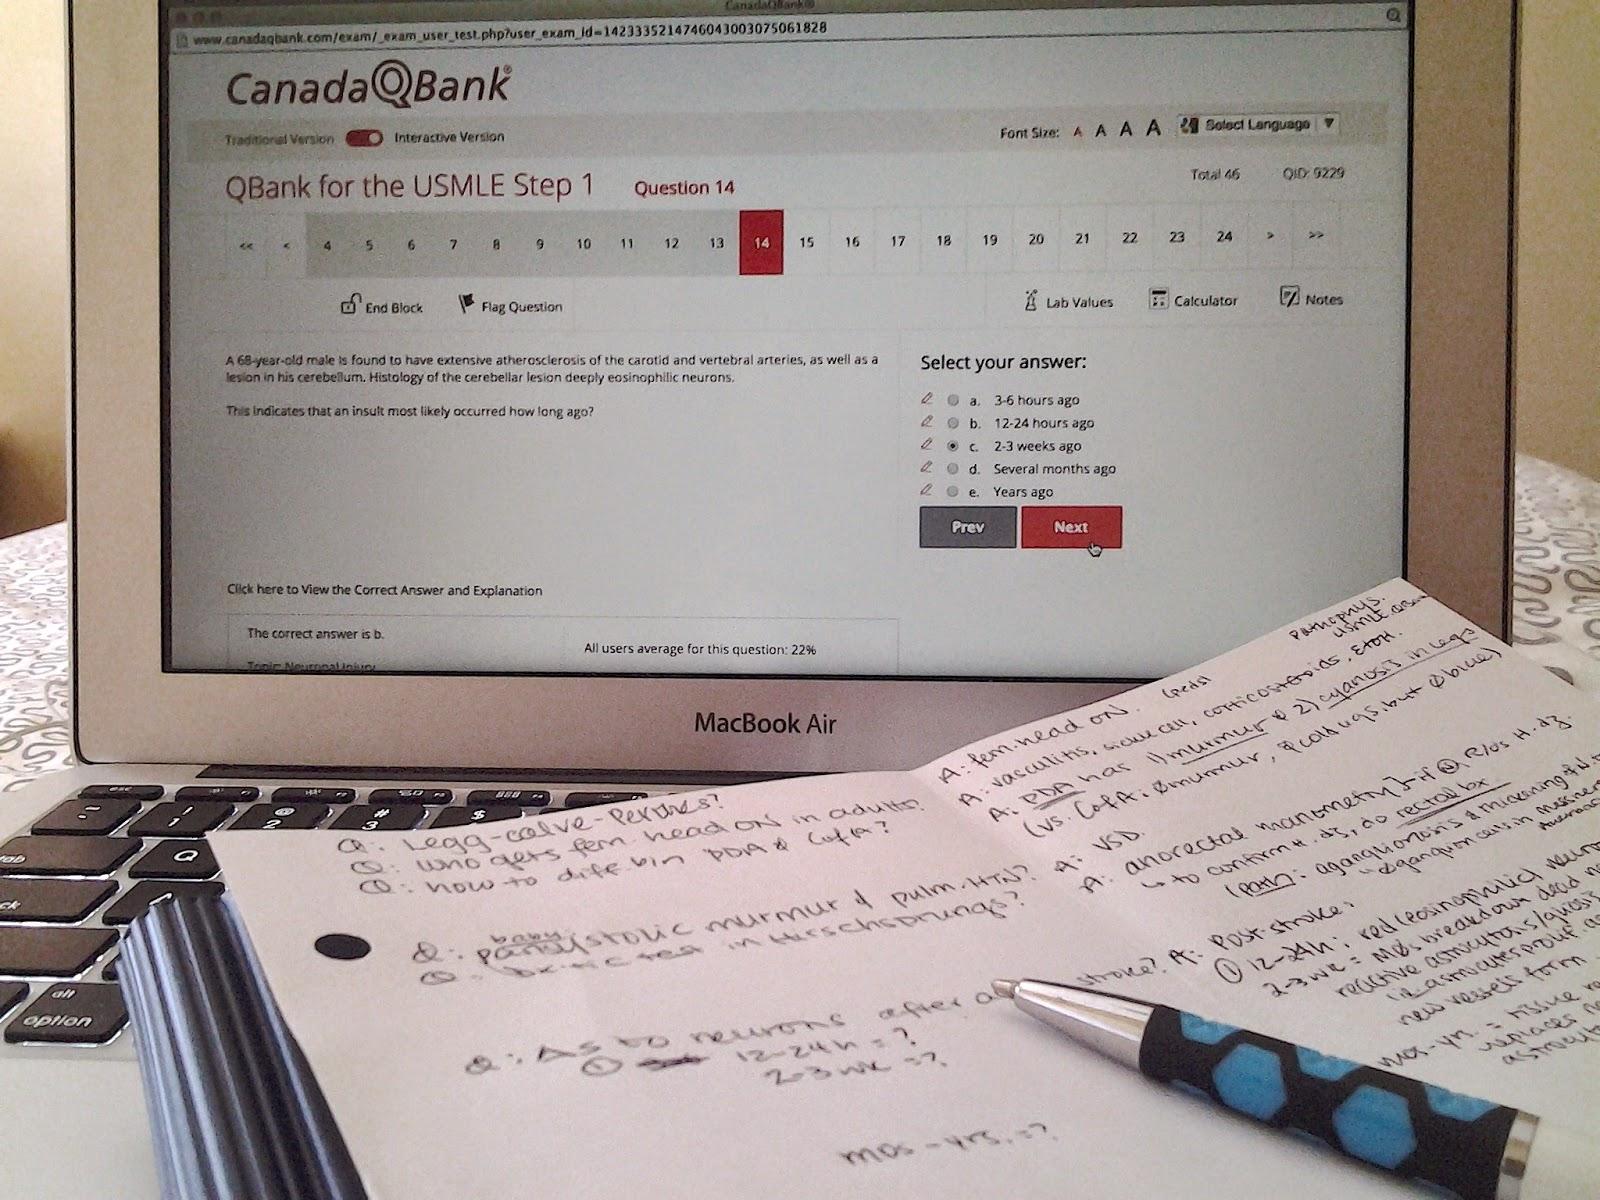 Canada qbank review